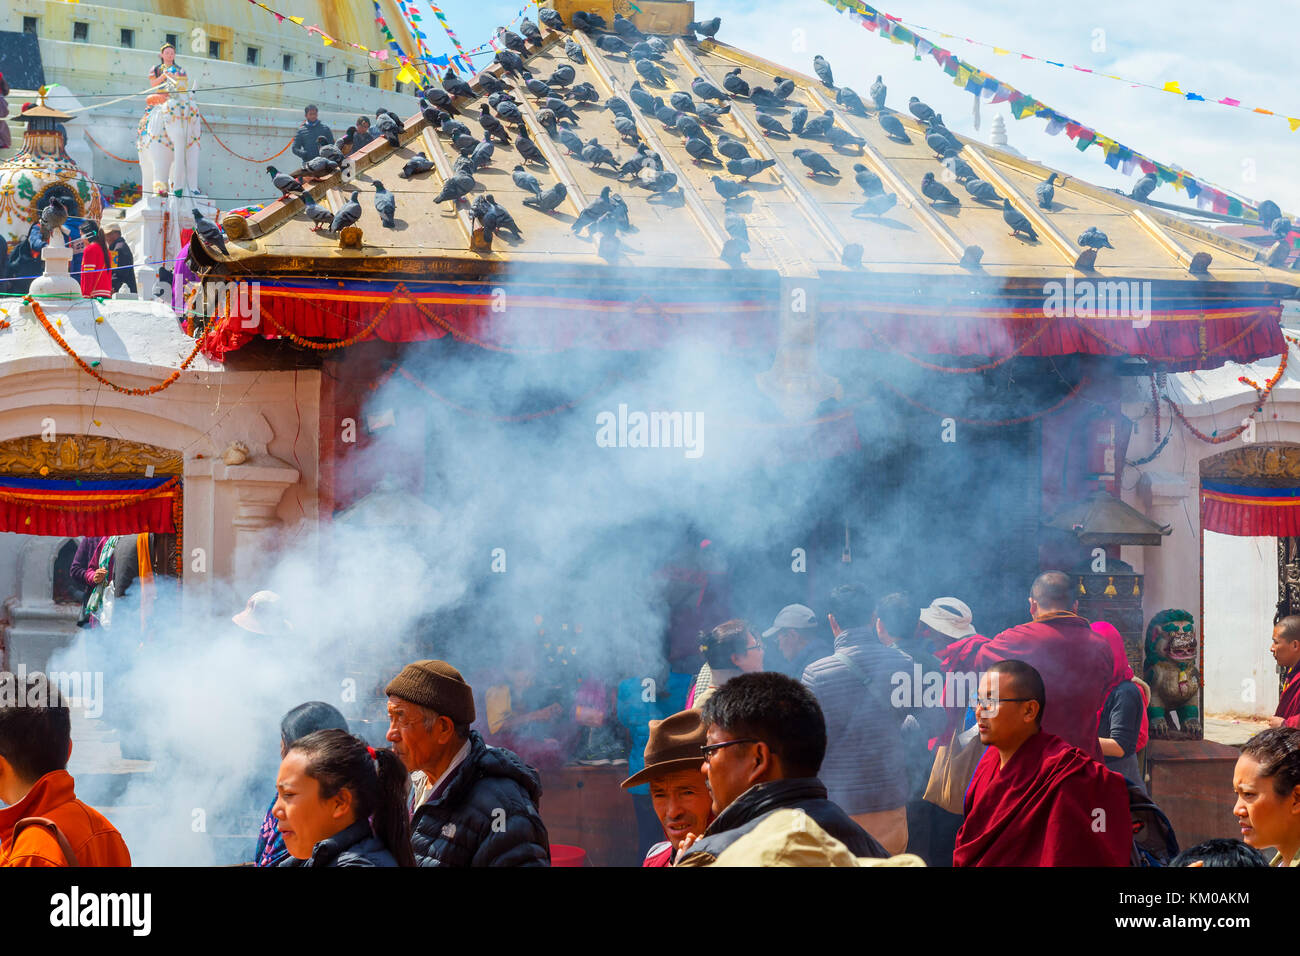 Buddhist pilgrims entering the Boudhanath Stupa, Largest Asian Stupa, Unesco World Heritage Site, Kathmandu, Nepal, Stock Photo